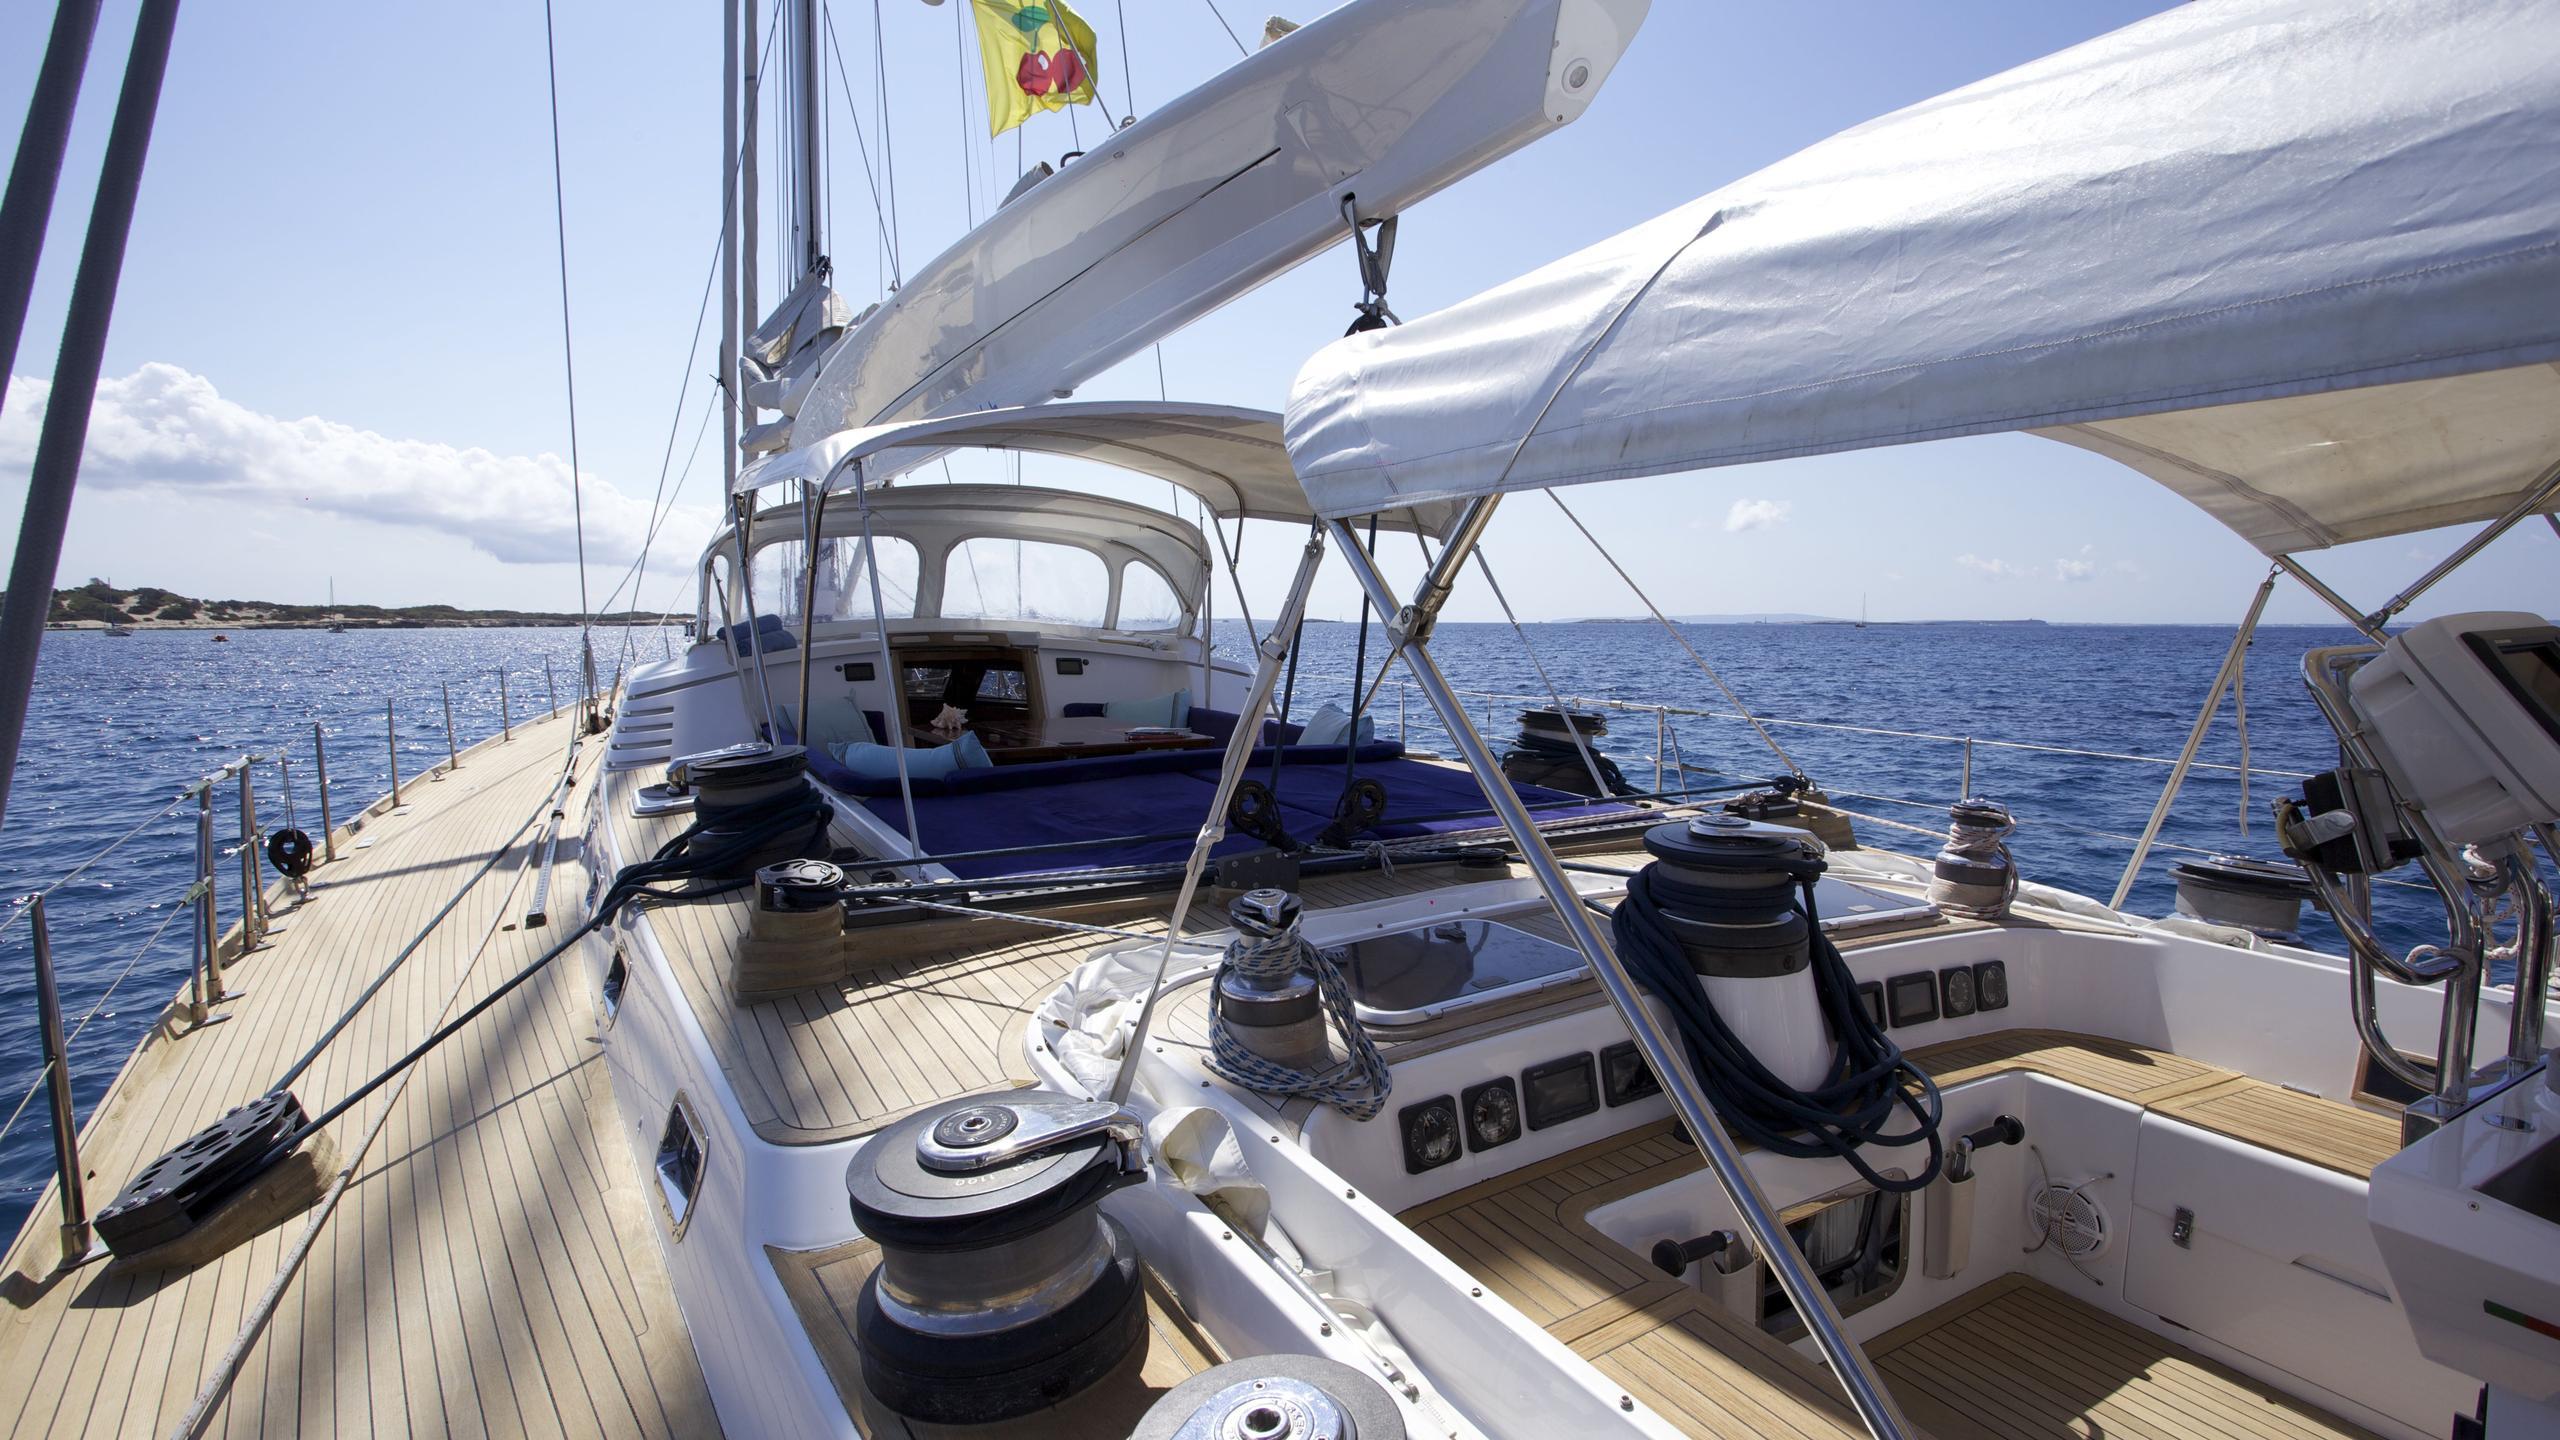 el-baile-yacht-side-deck